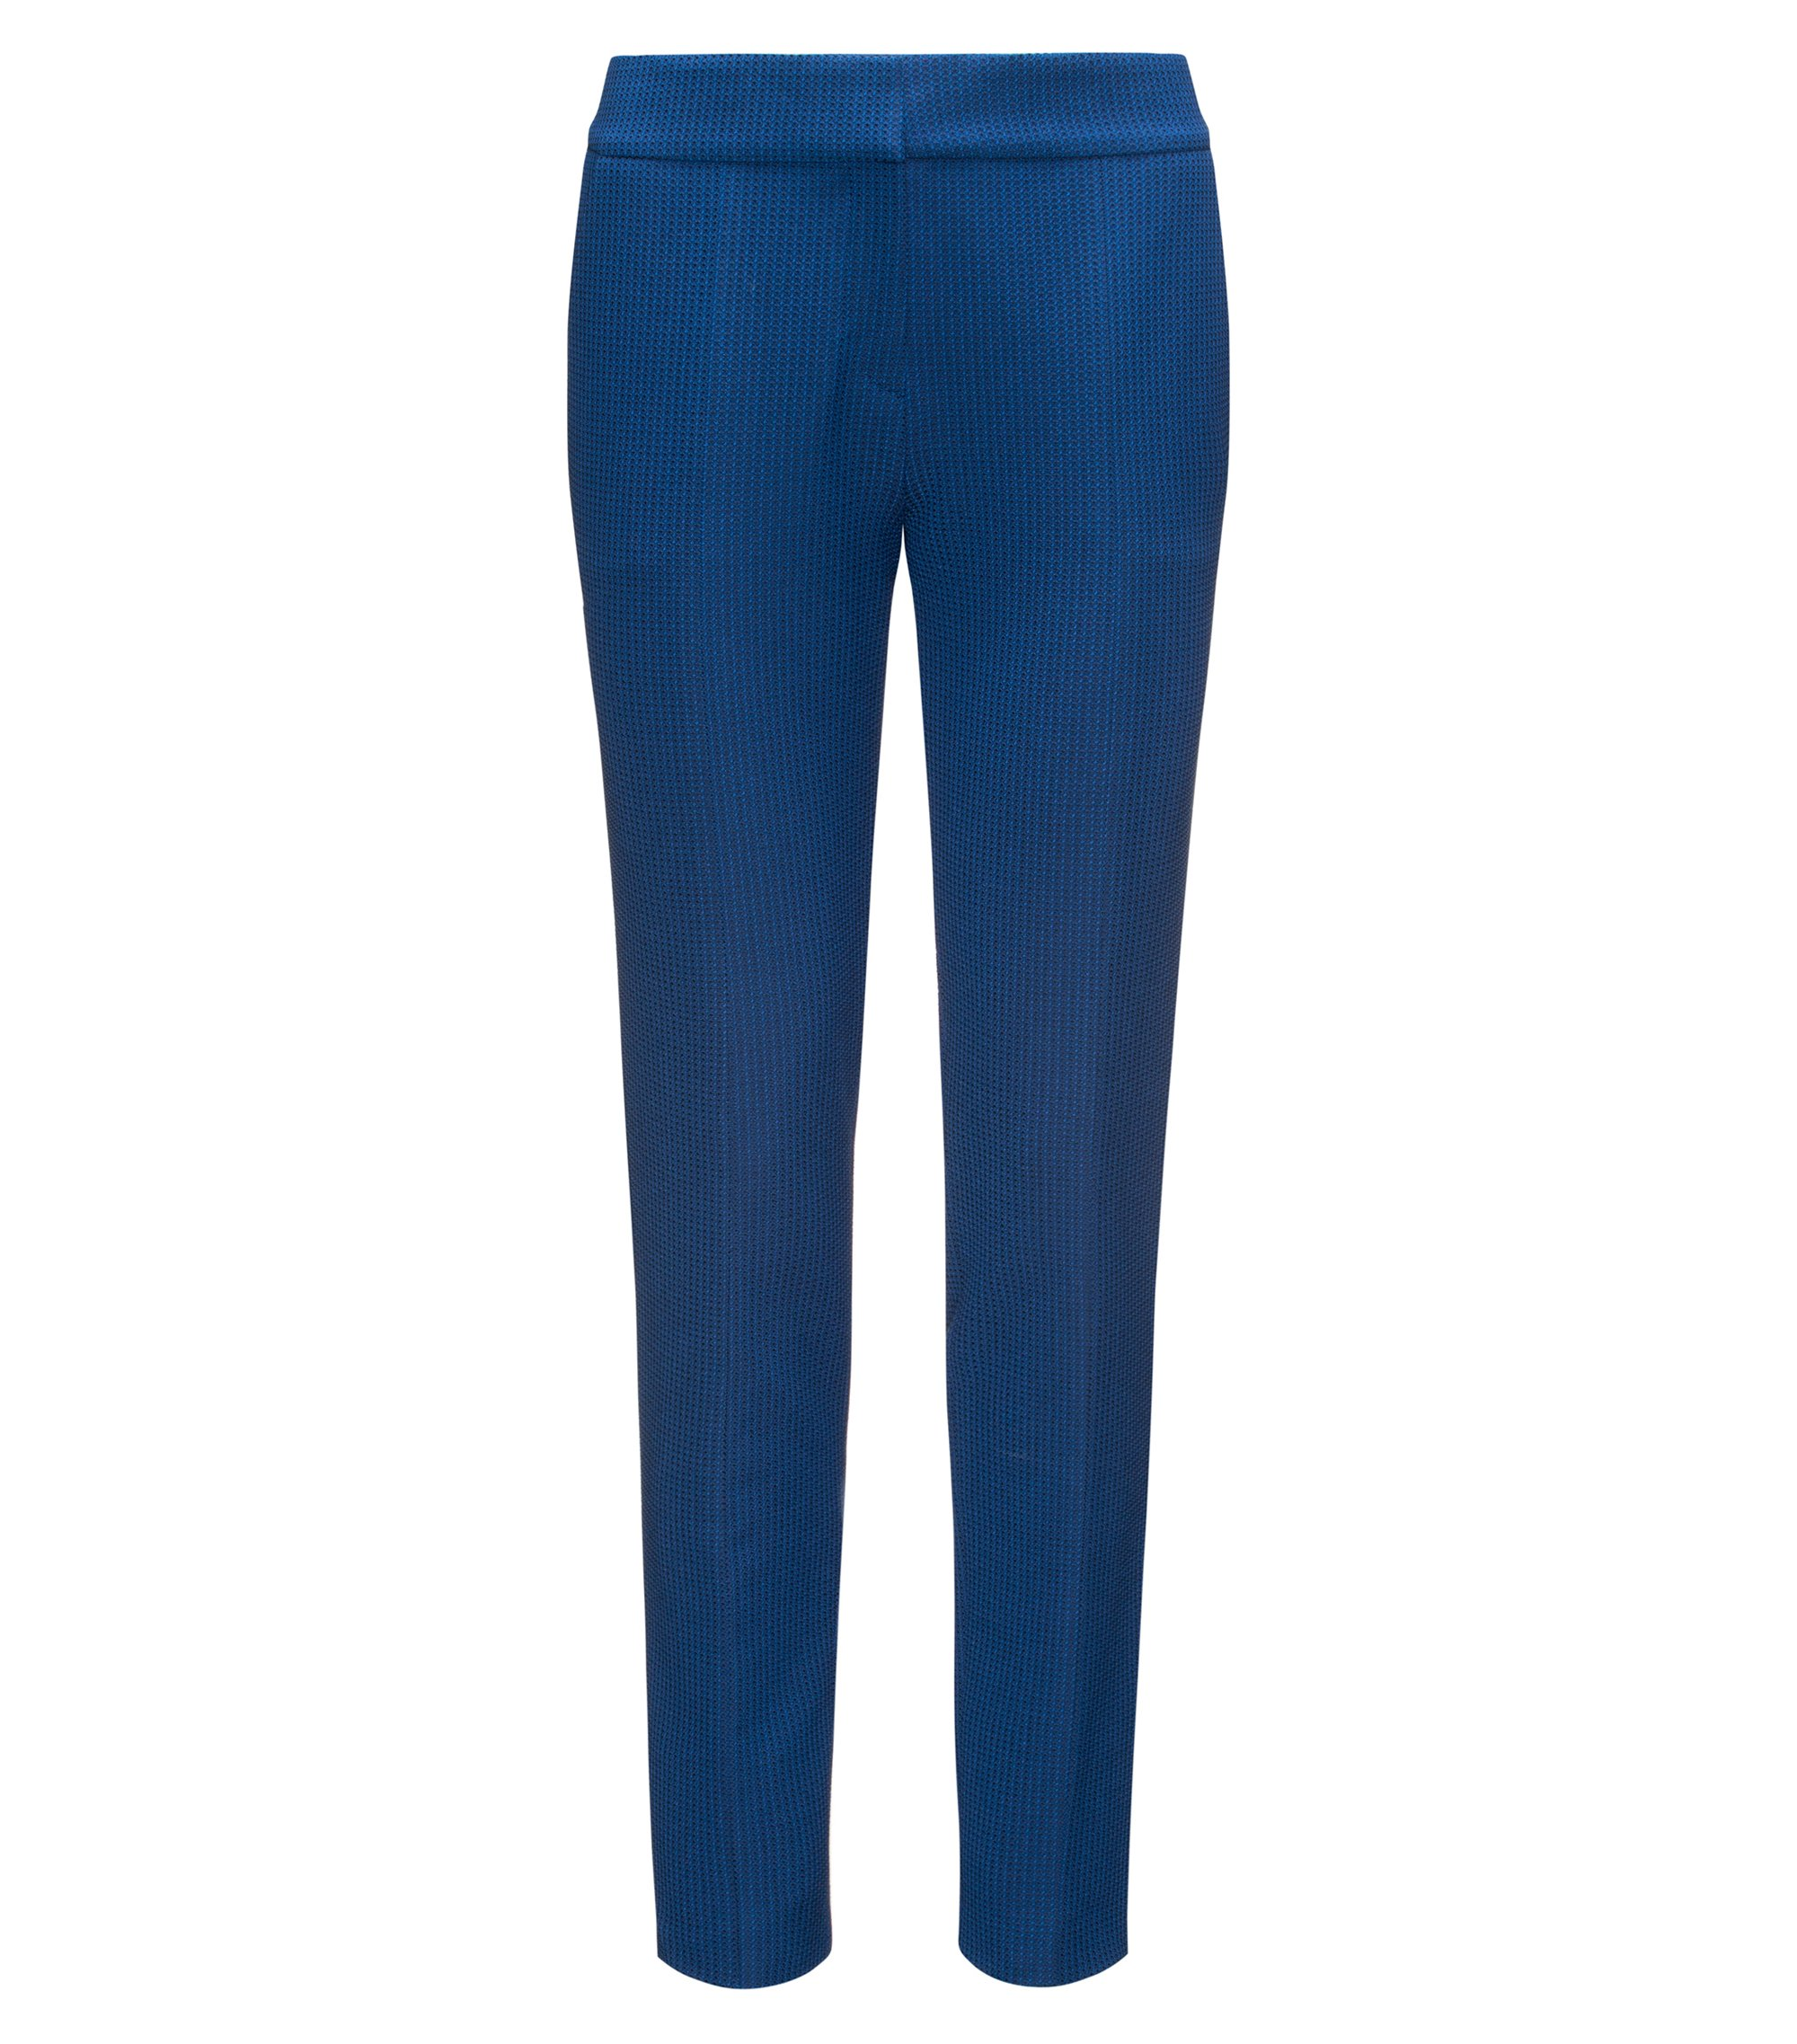 Patterned Cotton Blend Pant | Hevas, Dark Blue